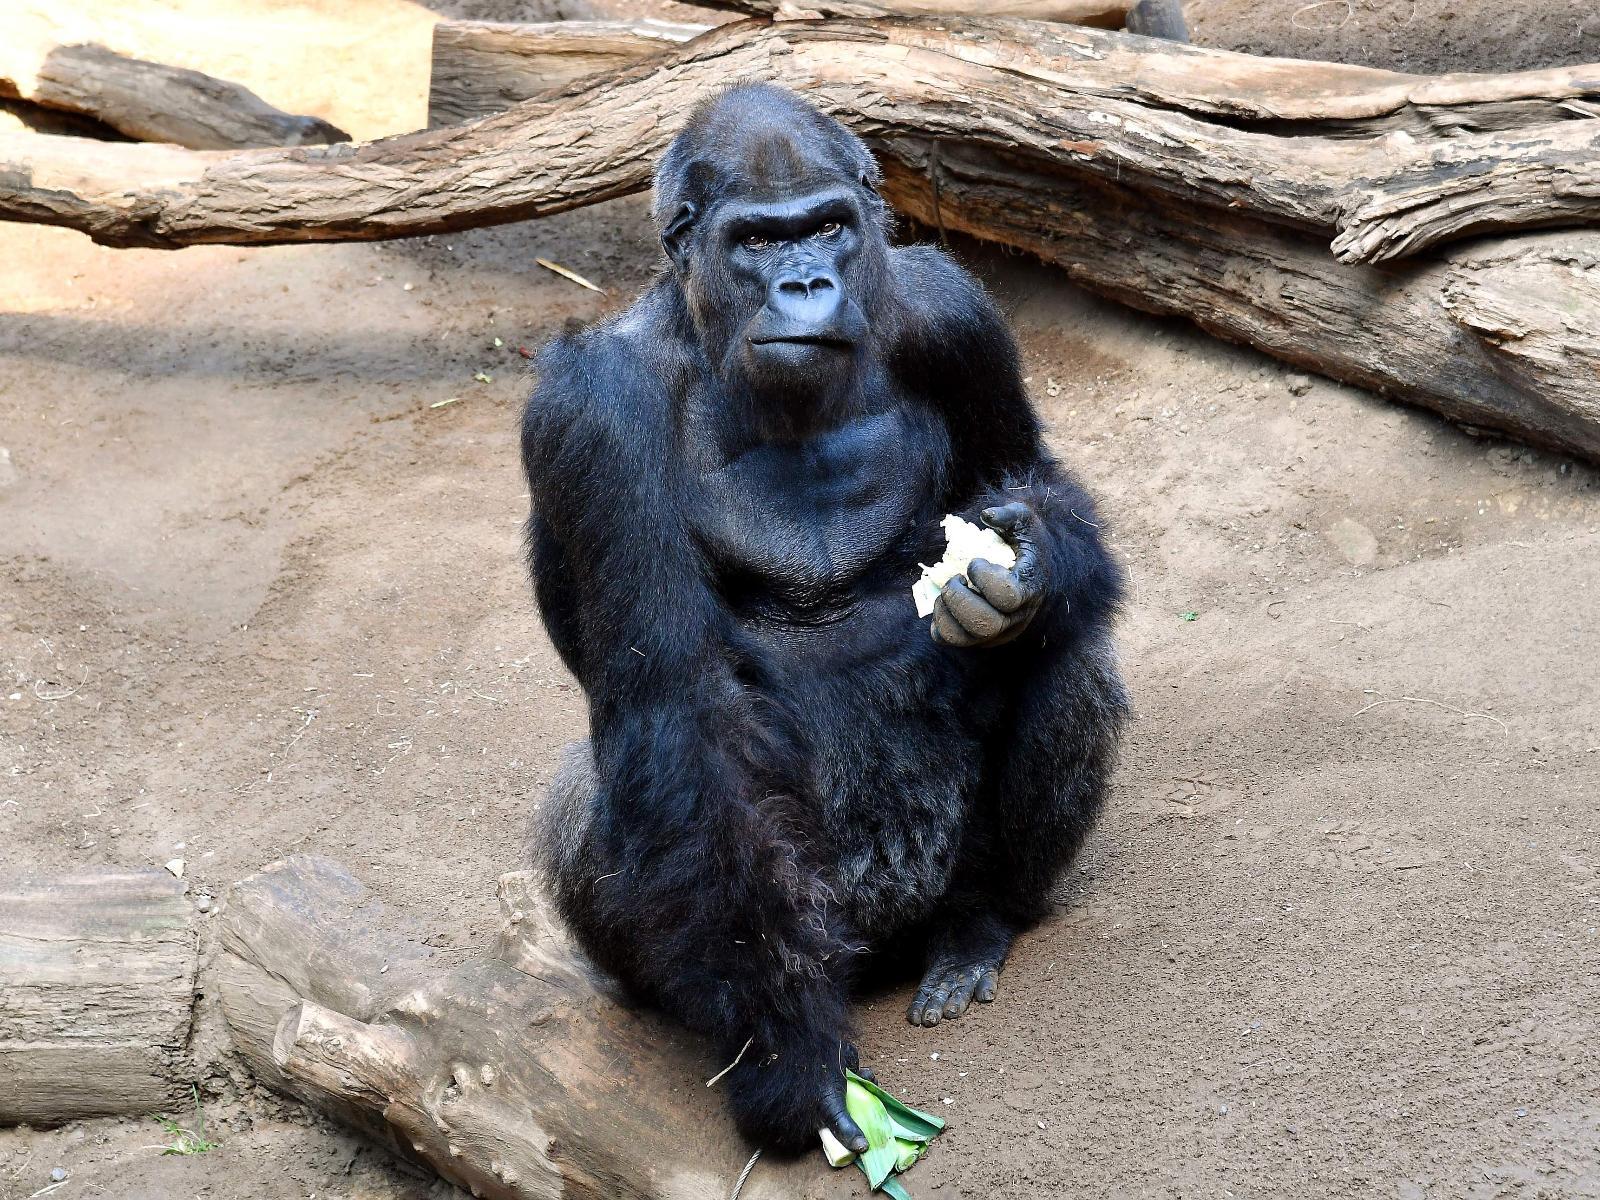 Gorilla Assumbo